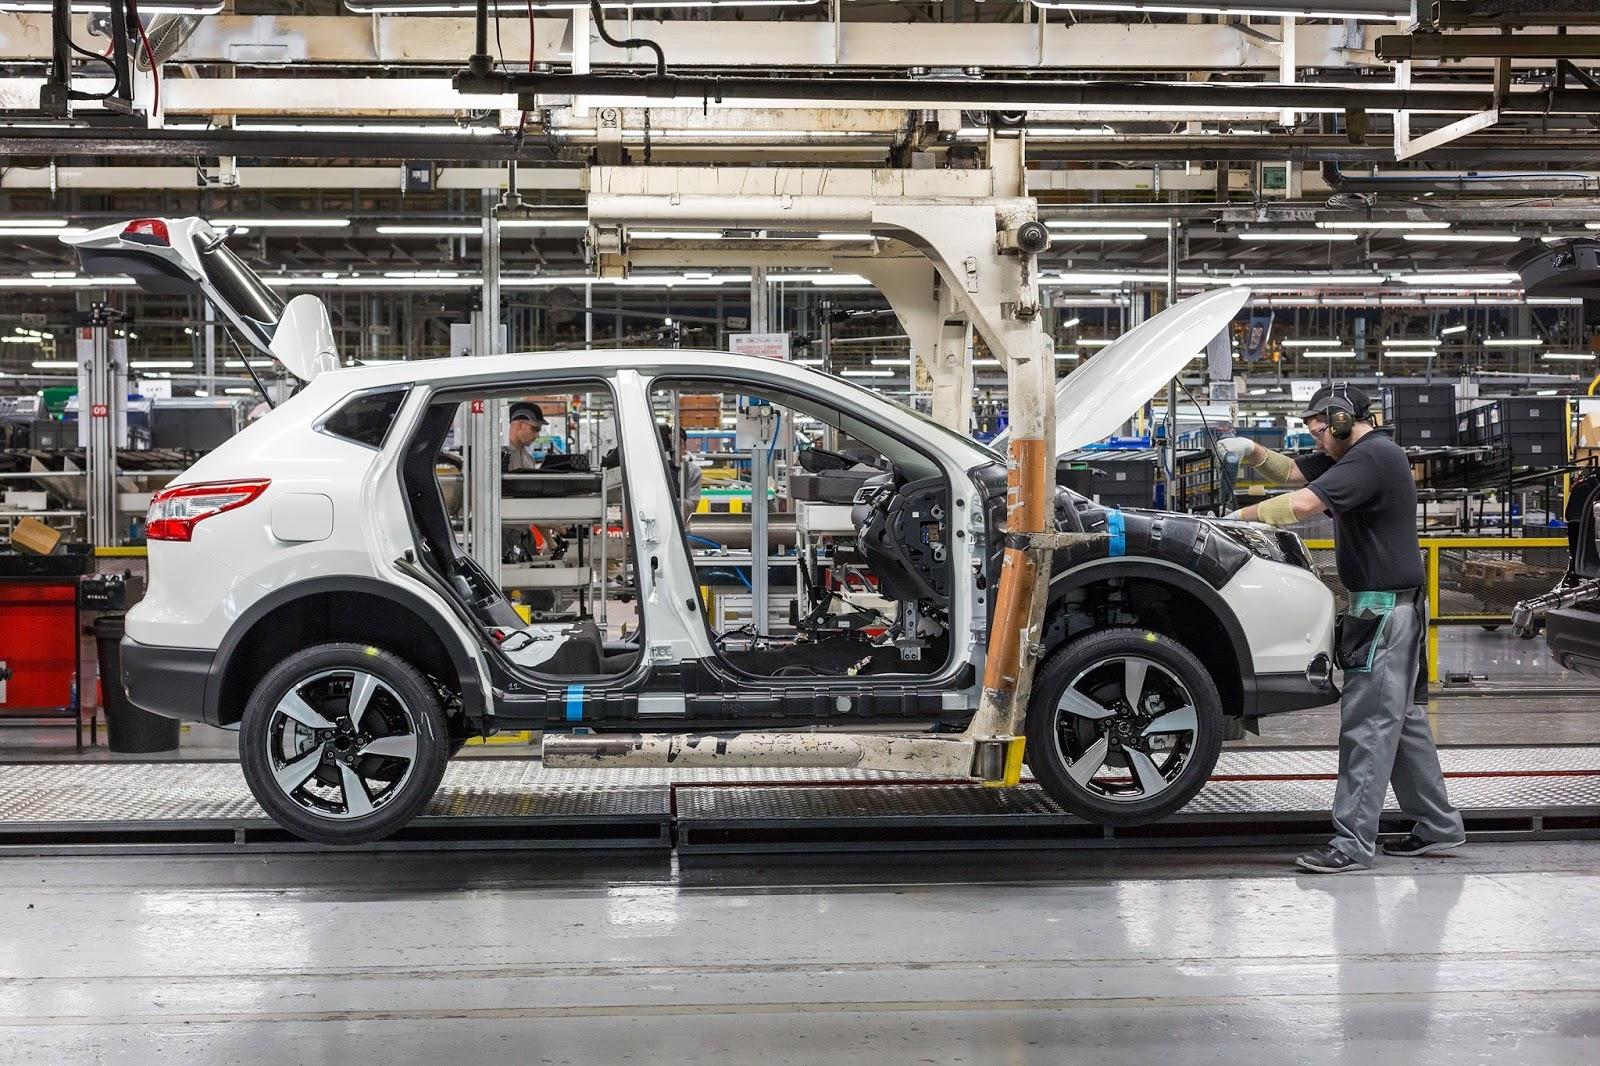 H Nissan αυξάνει τον όγκο παραγωγής του QASHQAI!